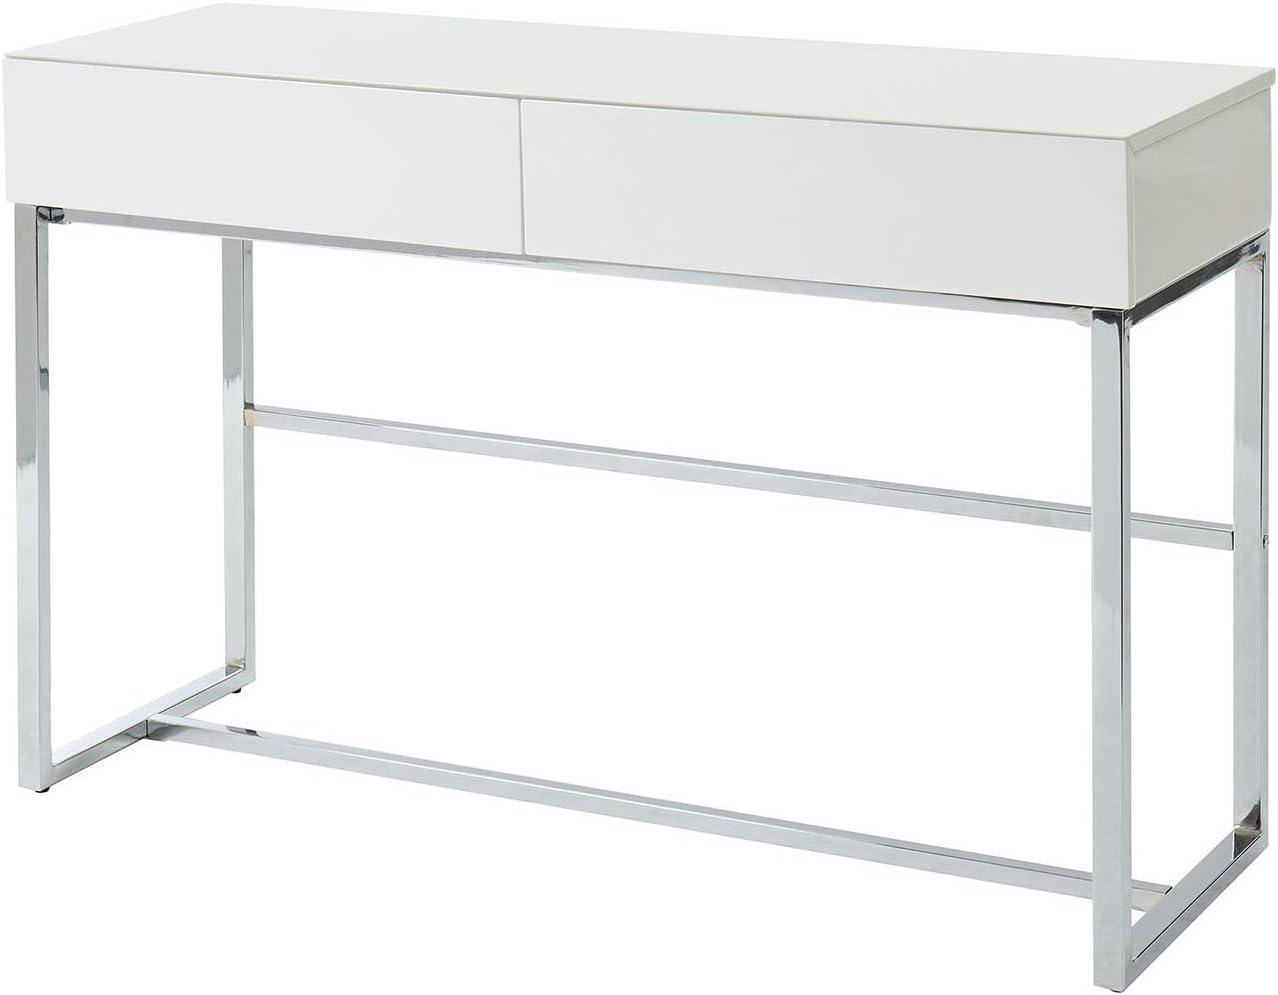 Furniture of America Juni Sofa Table, White